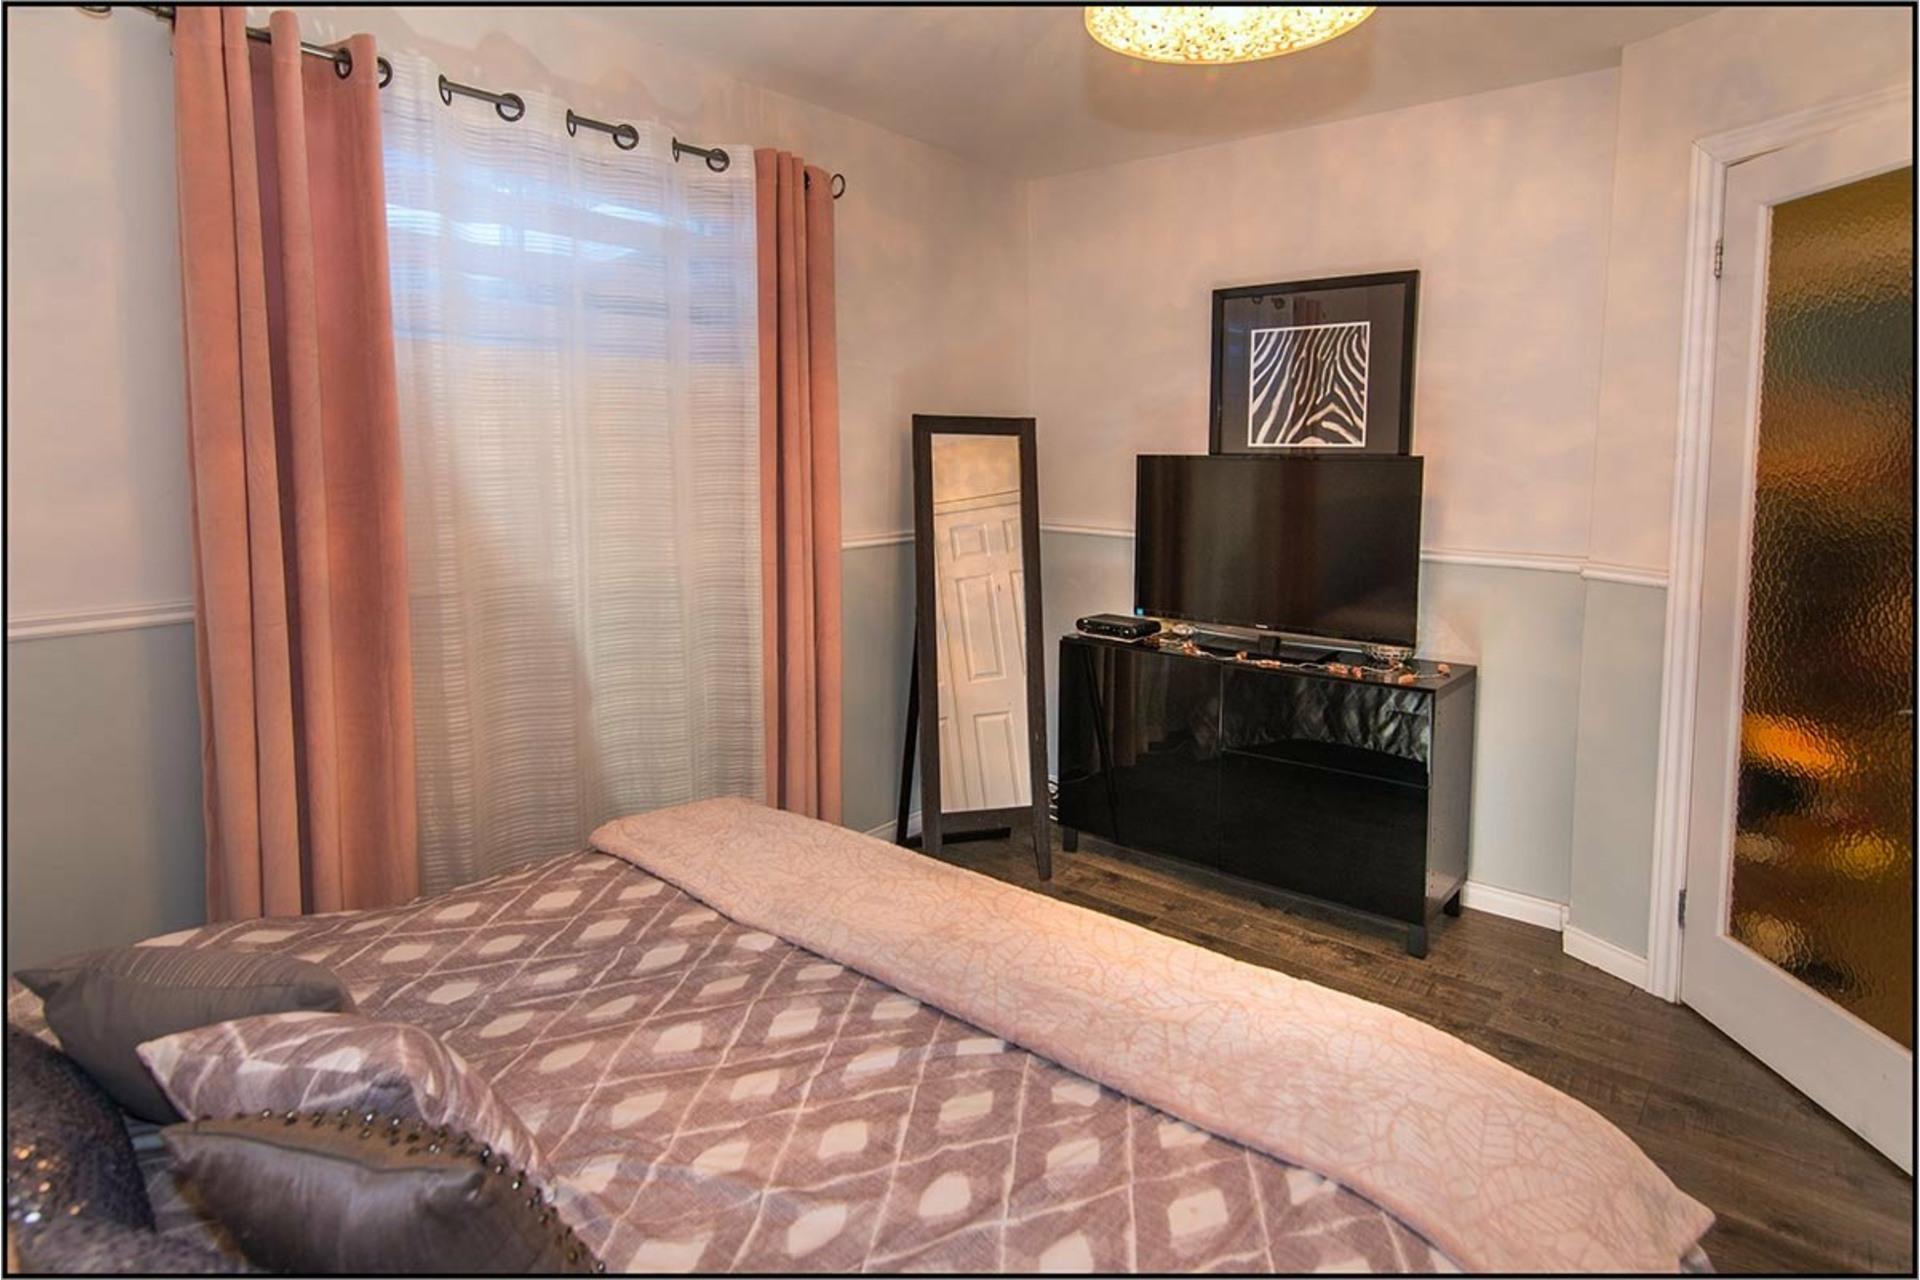 image 14 - House For sale Sainte-Foy/Sillery/Cap-Rouge Québec  - 13 rooms